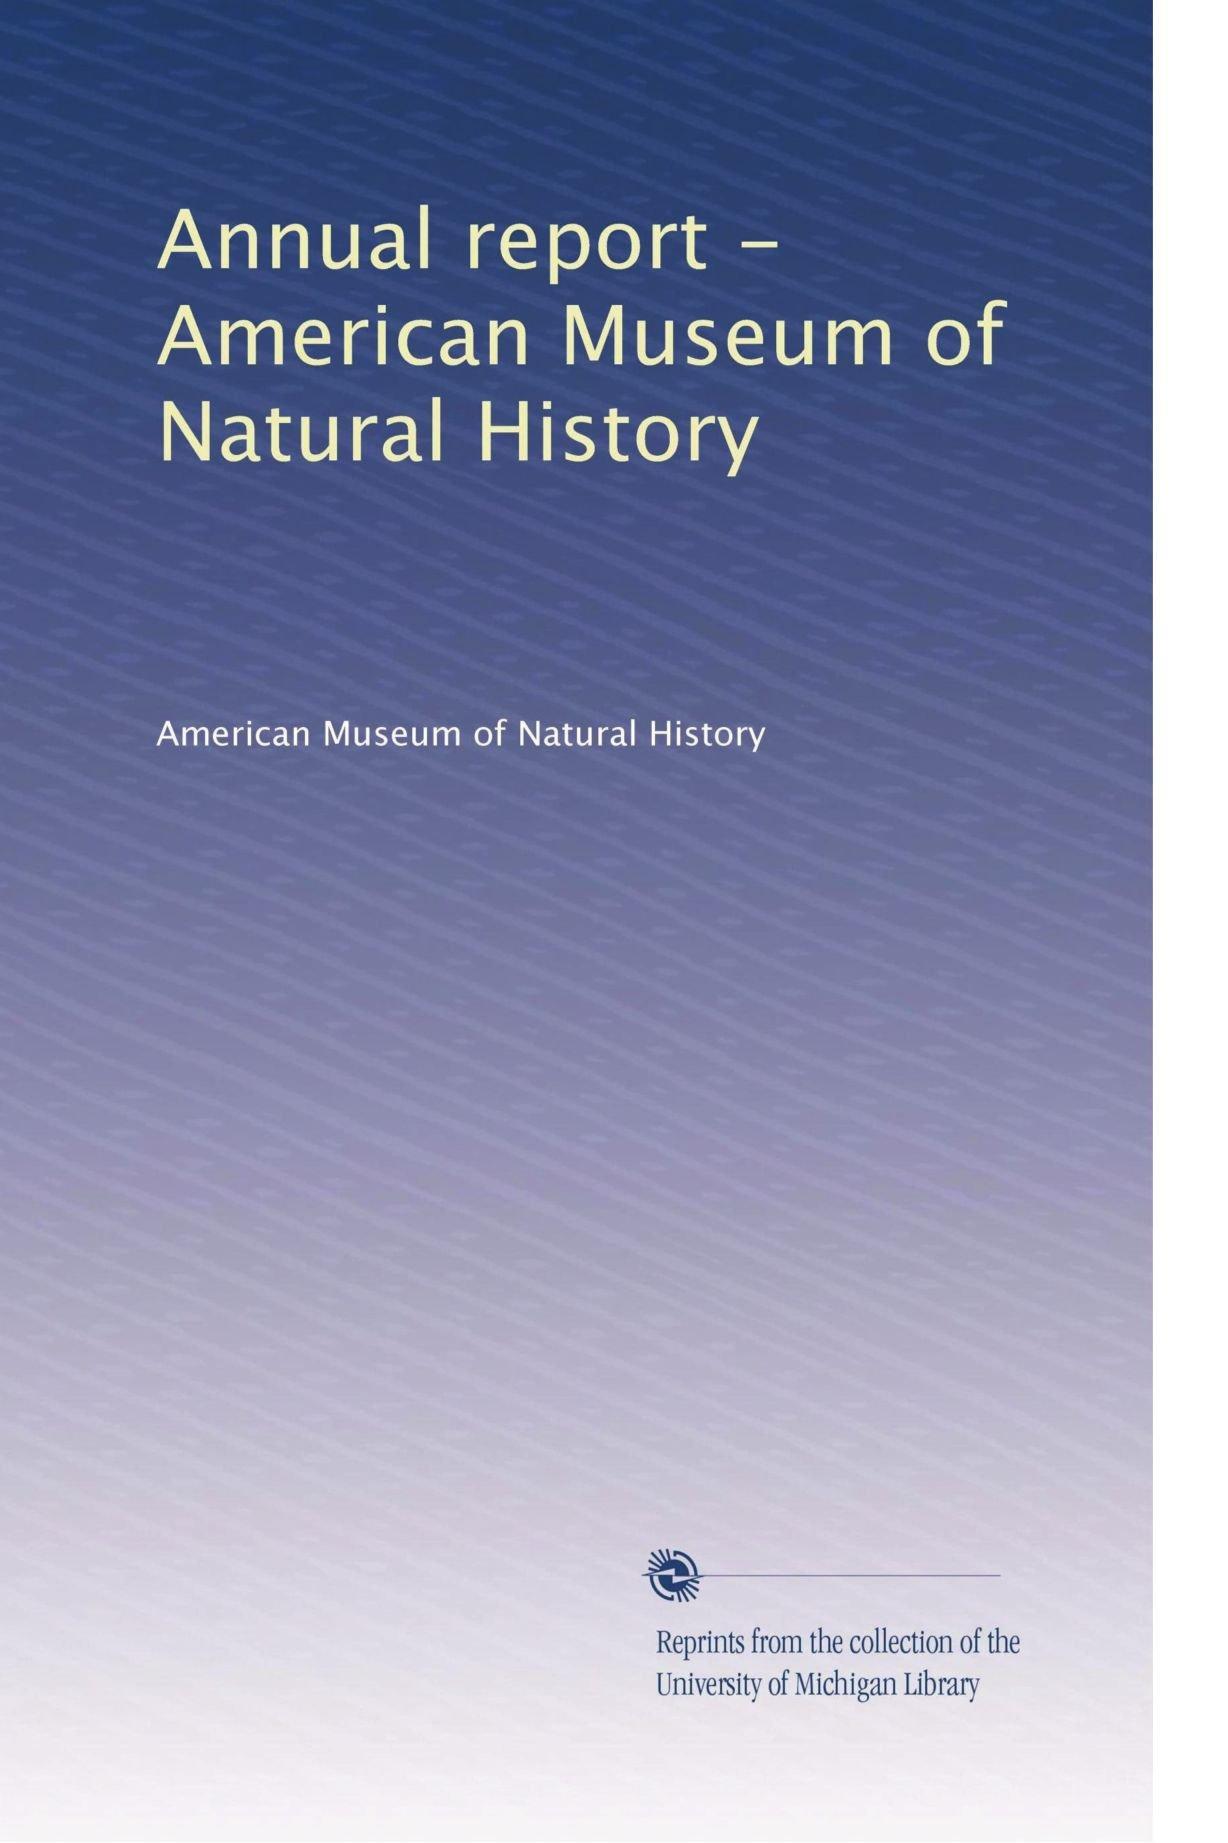 Annual report - American Museum of Natural History (Volume 5) PDF